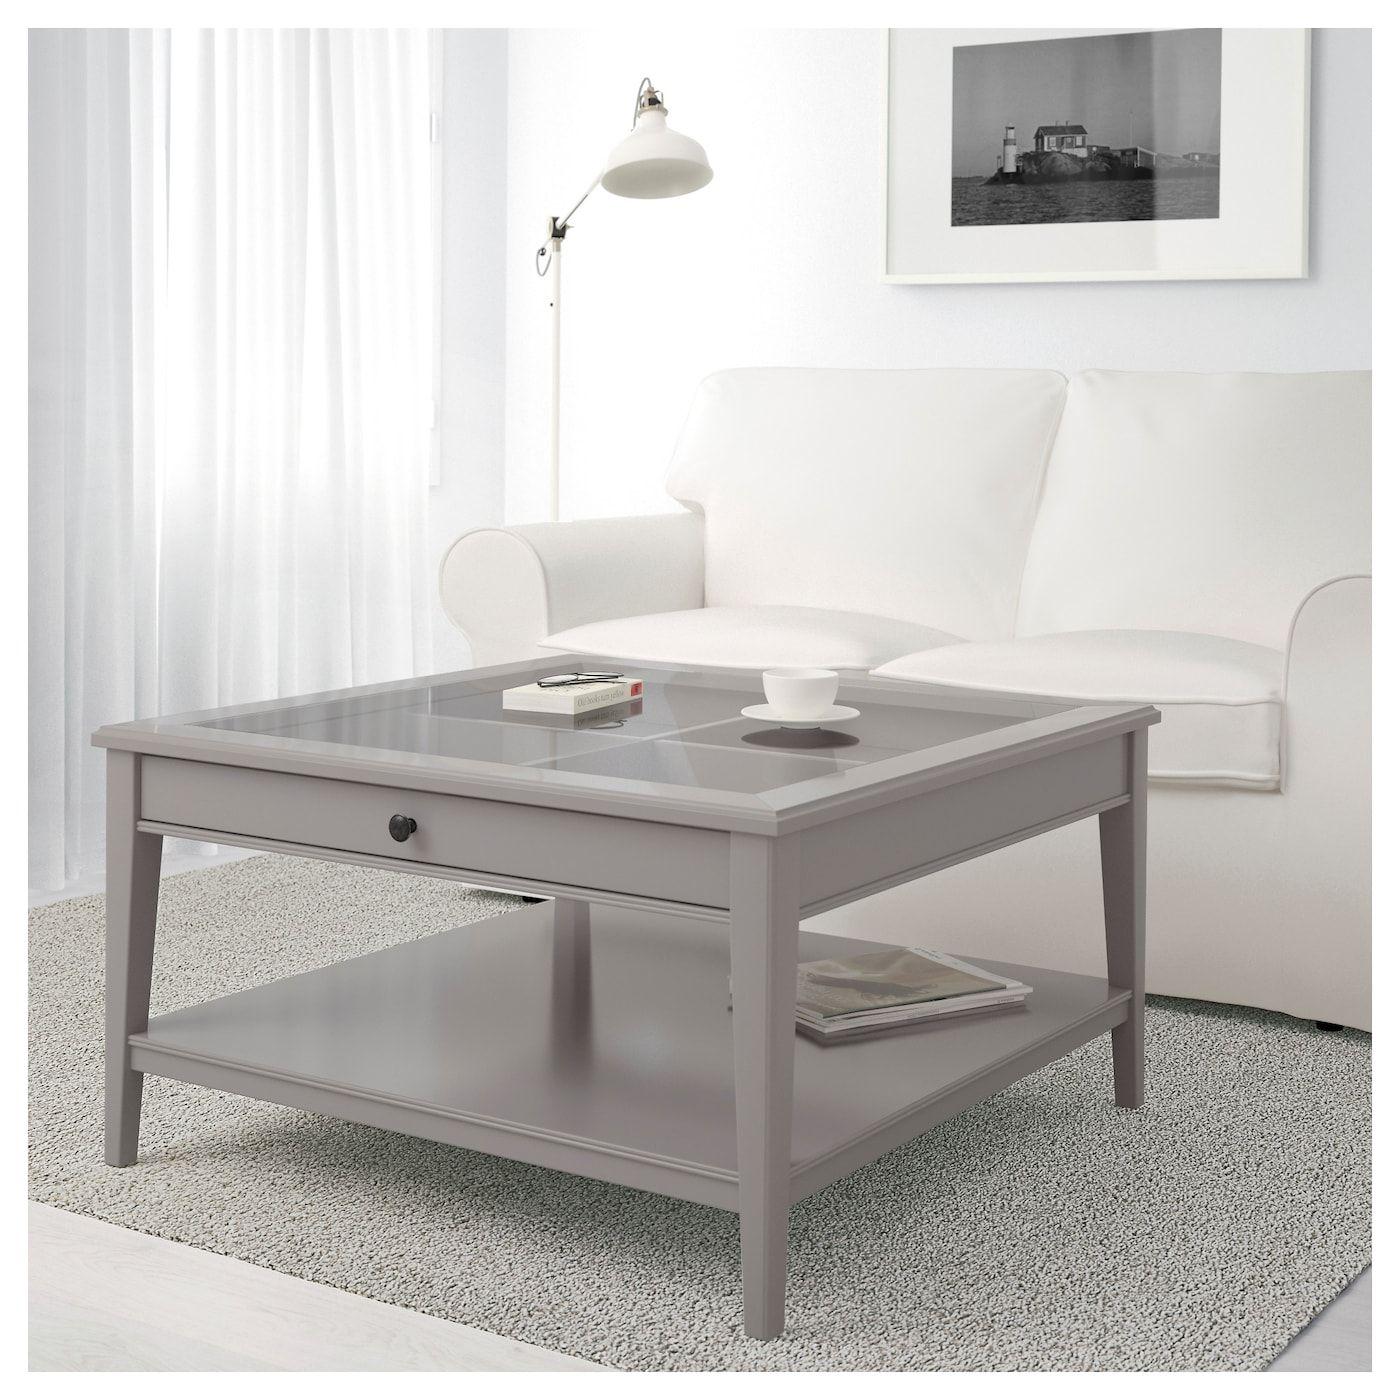 30+ White glass coffee table ikea ideas